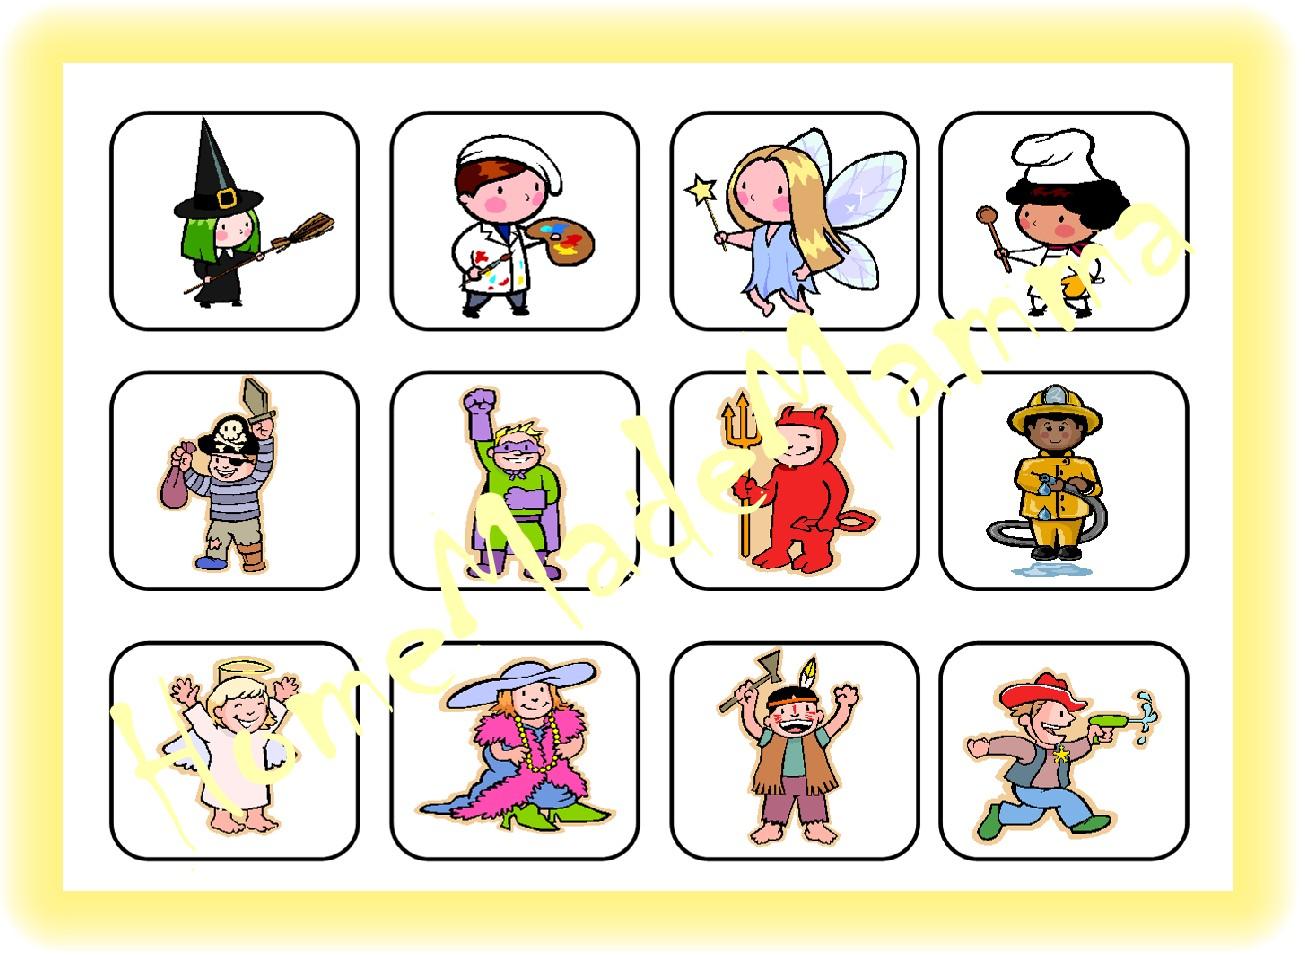 Ben noto giochi per bambini | HomeMadeMamma GC16